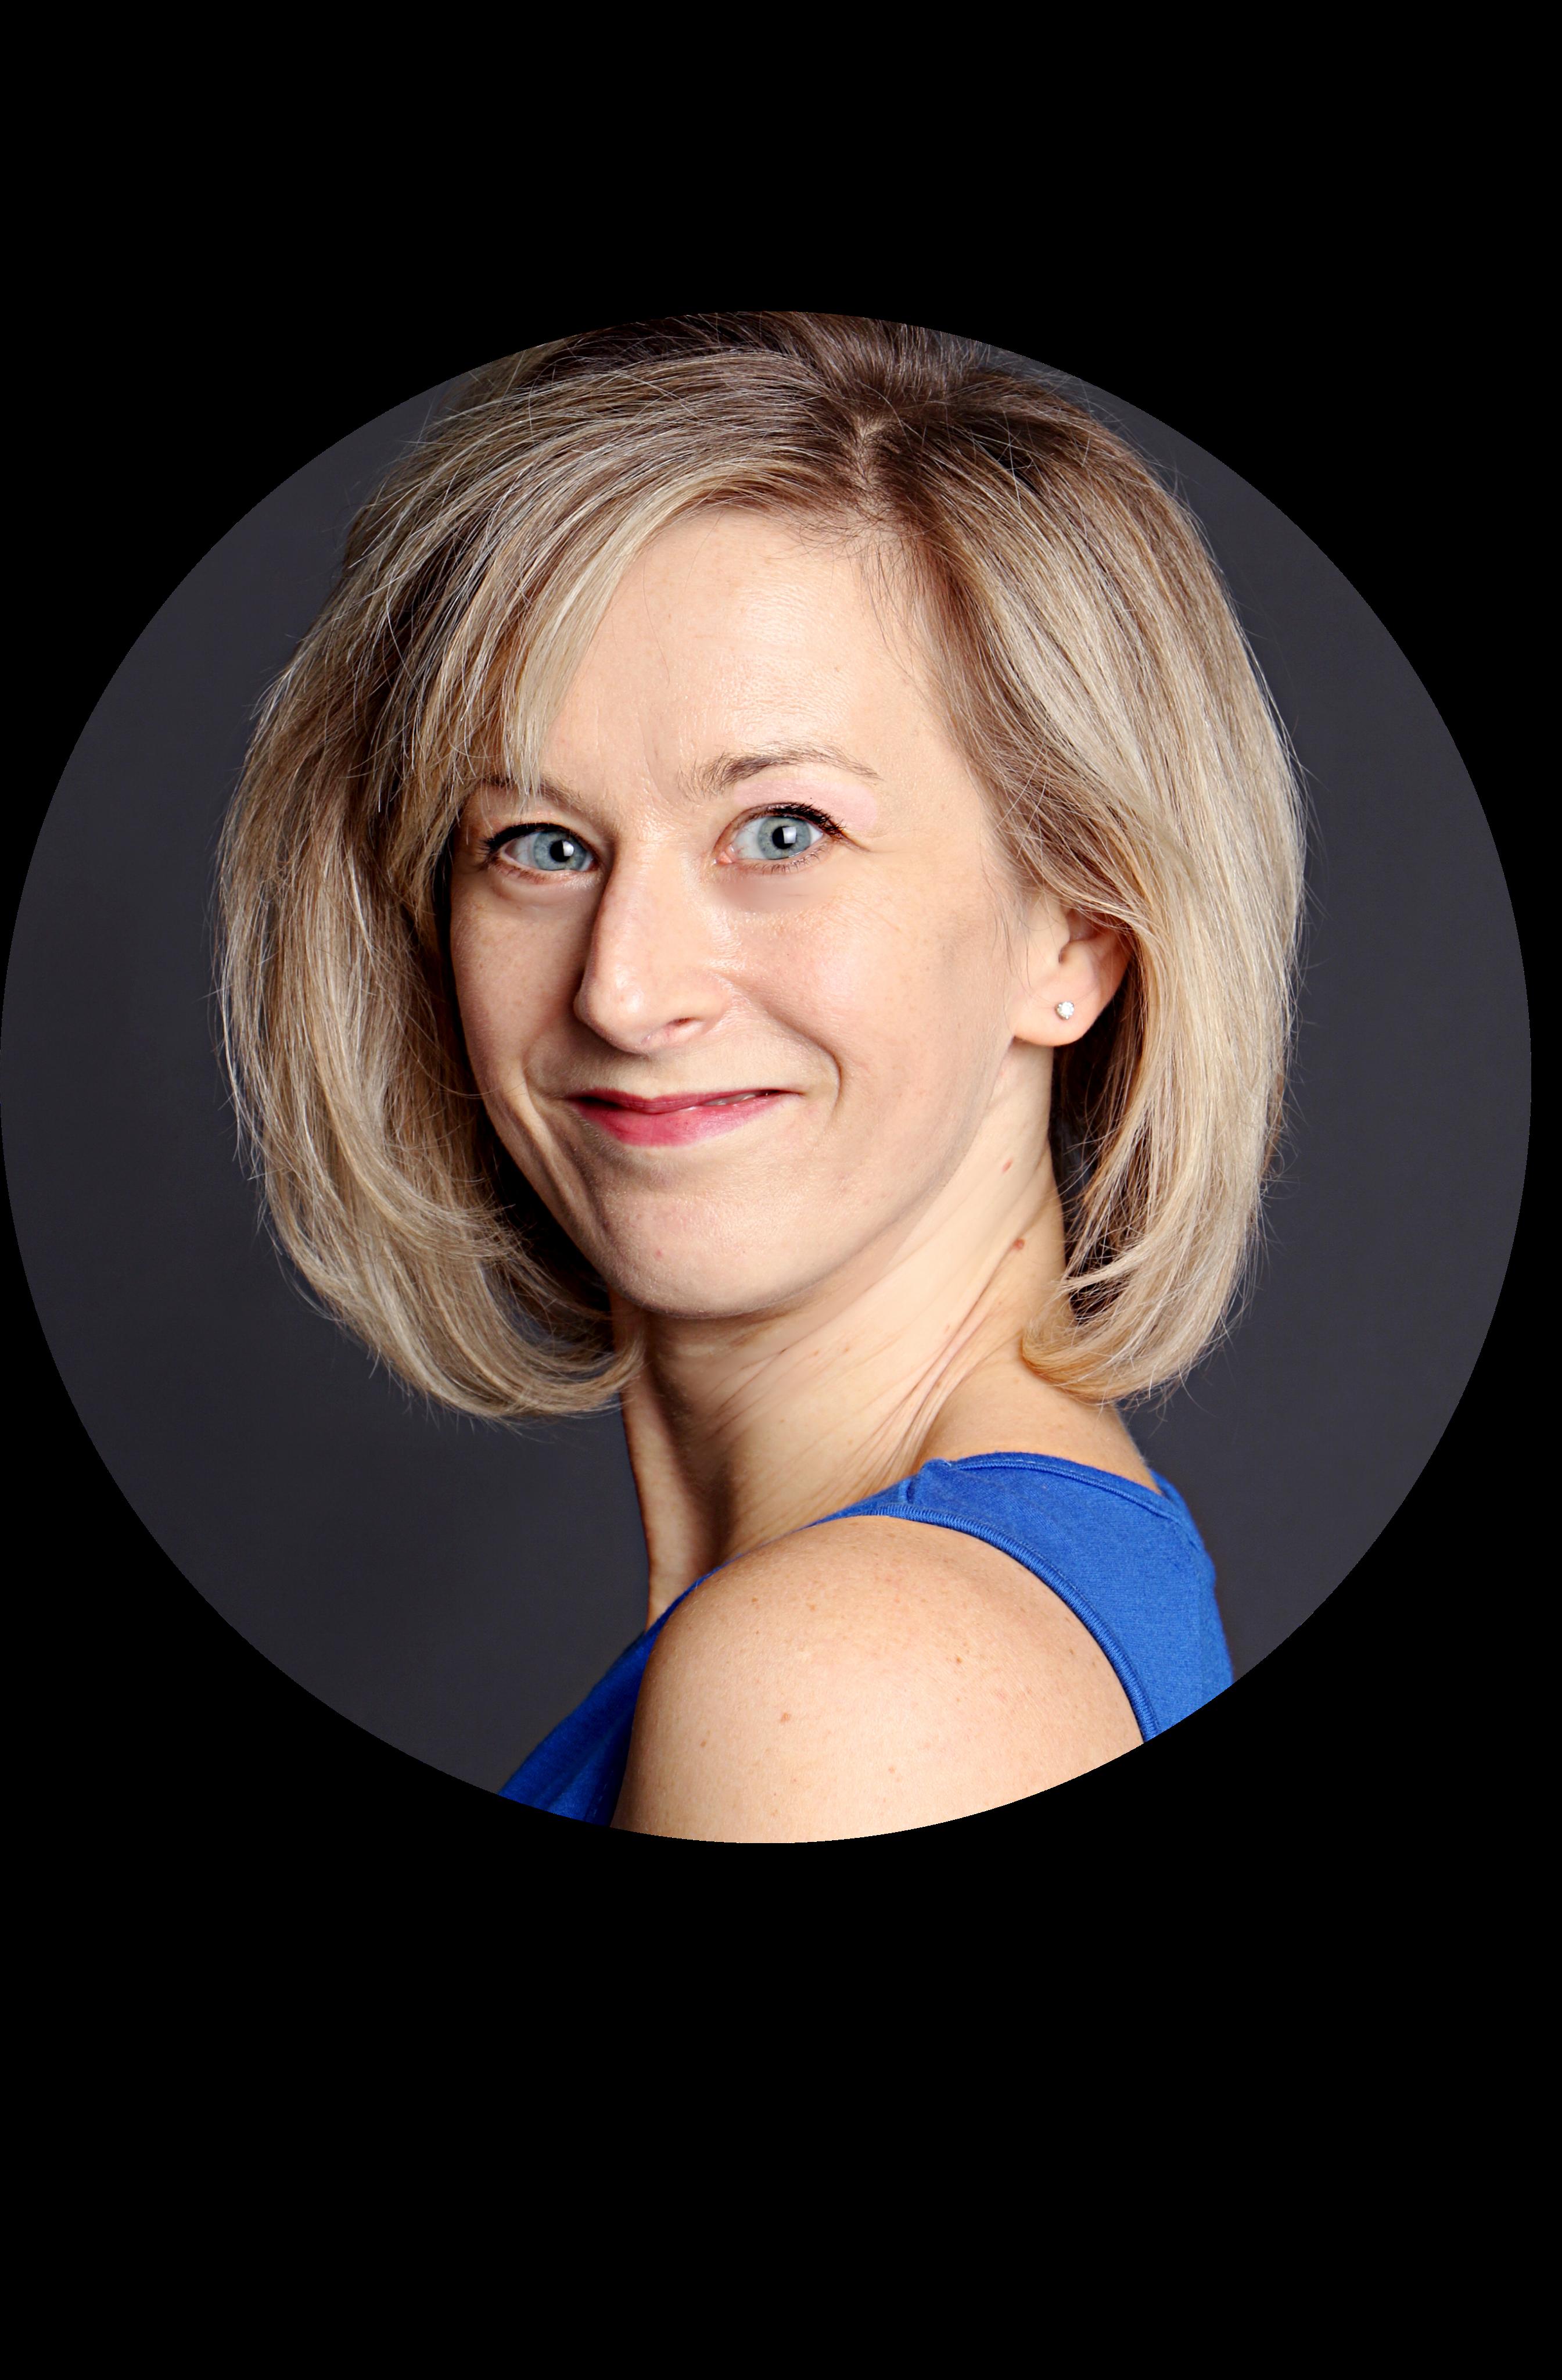 Lisa Goller. Content Marketing Strategist. lisagoller.com Toronto Canada. USA. UK. Ireland. France. China.